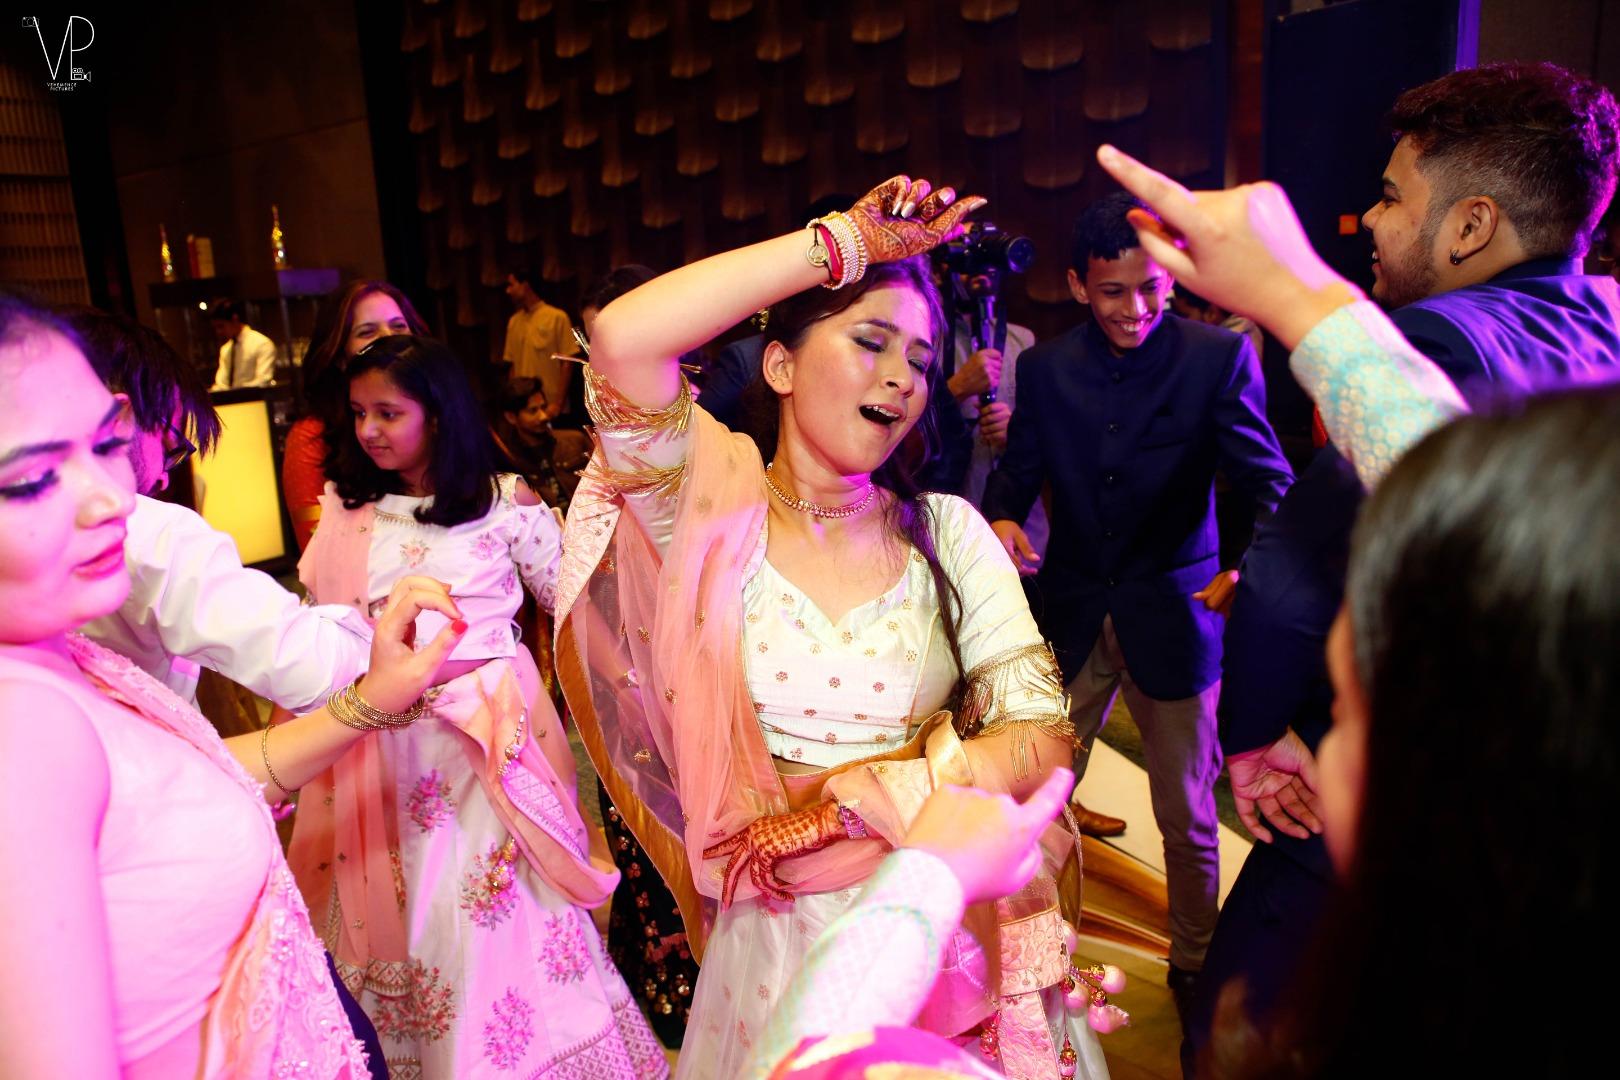 Fun Dancing in Indian Weddings